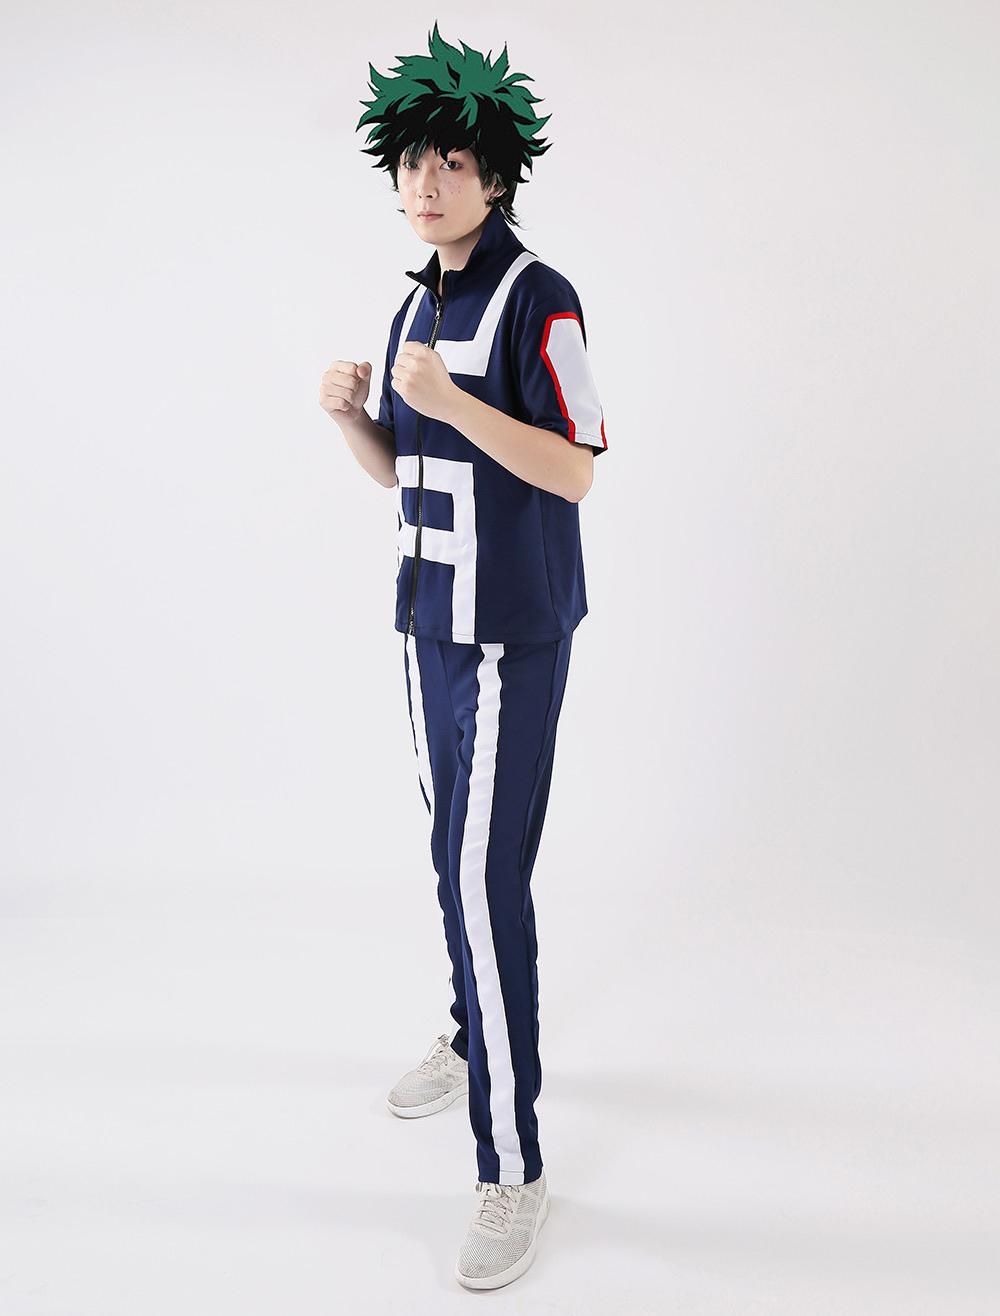 My Hero Academia Deku Cosplay Bnha Midoriya Izuku Cosplay Costume Gym Suit Halloween